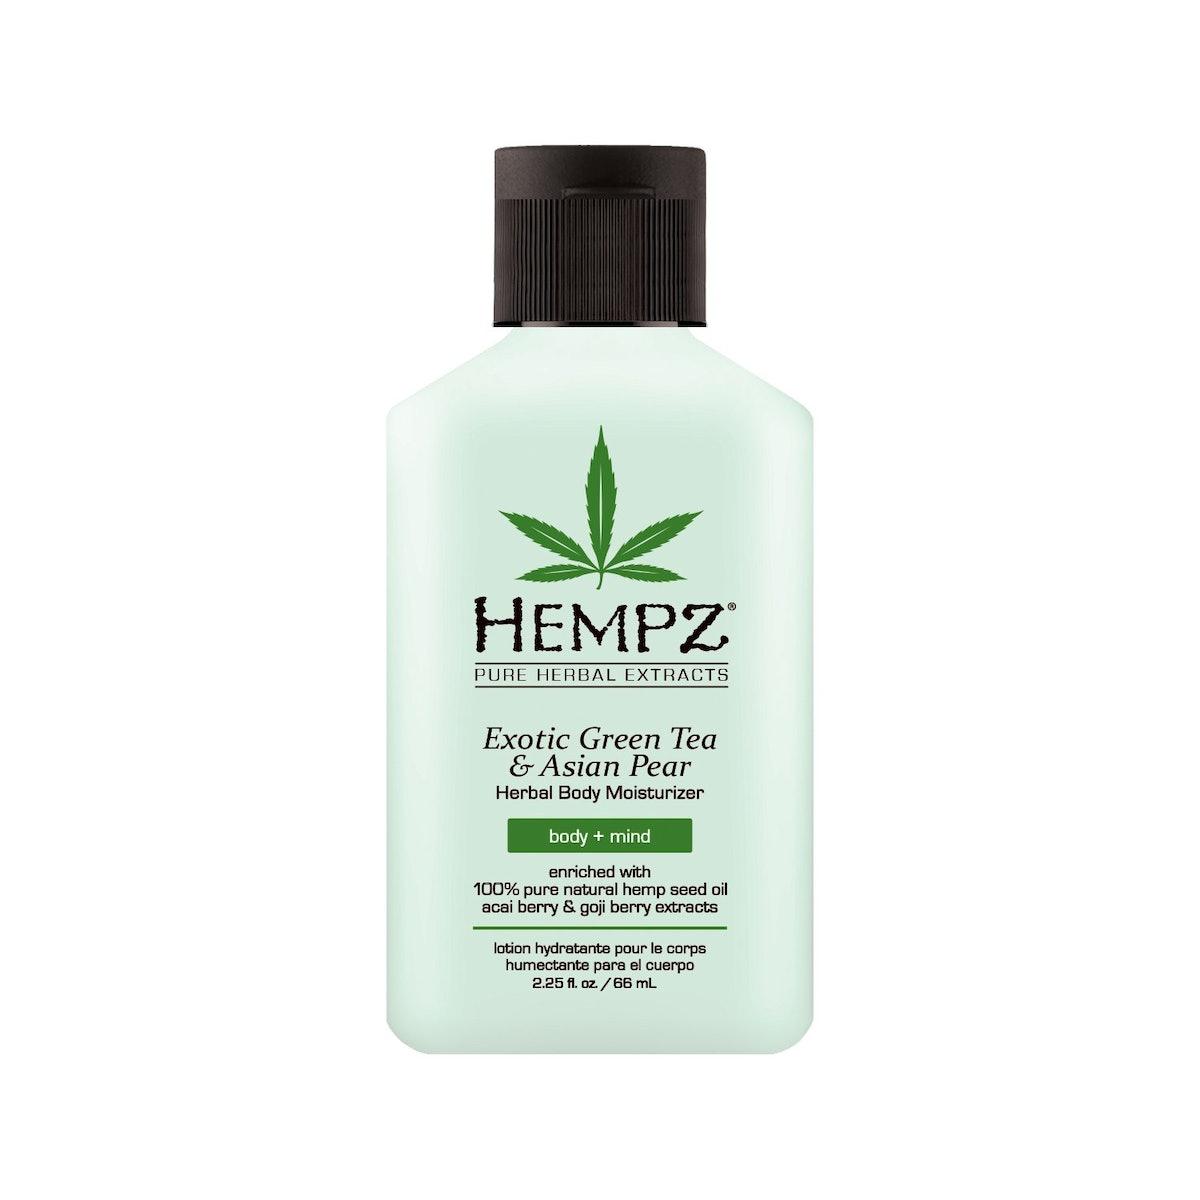 Hempz Herbal Body Moisturizer with Pure Hemp Seed Oil